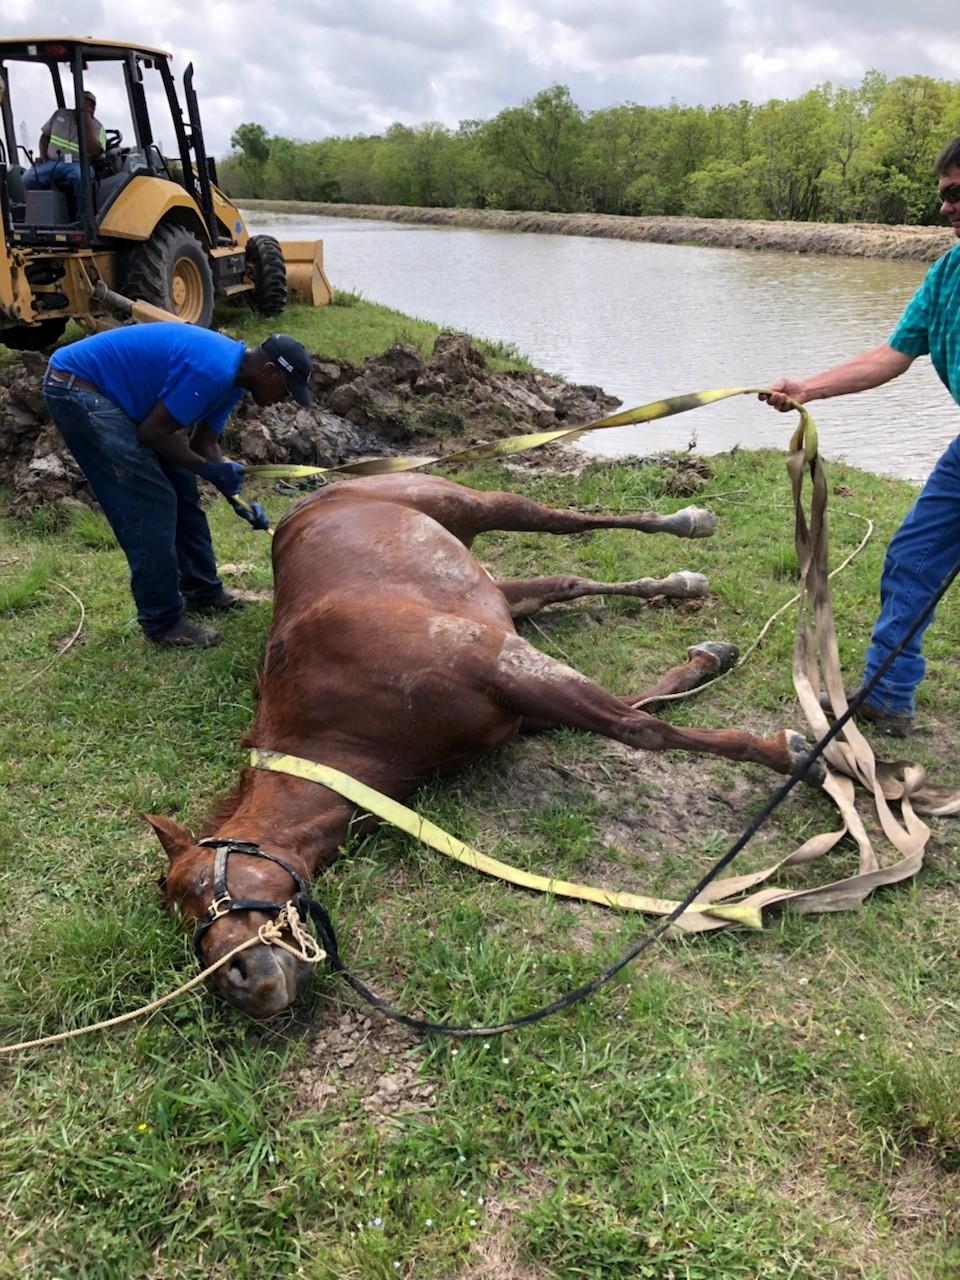 Press Releases - Horse Rescue in Port Arthur - Sheriff's